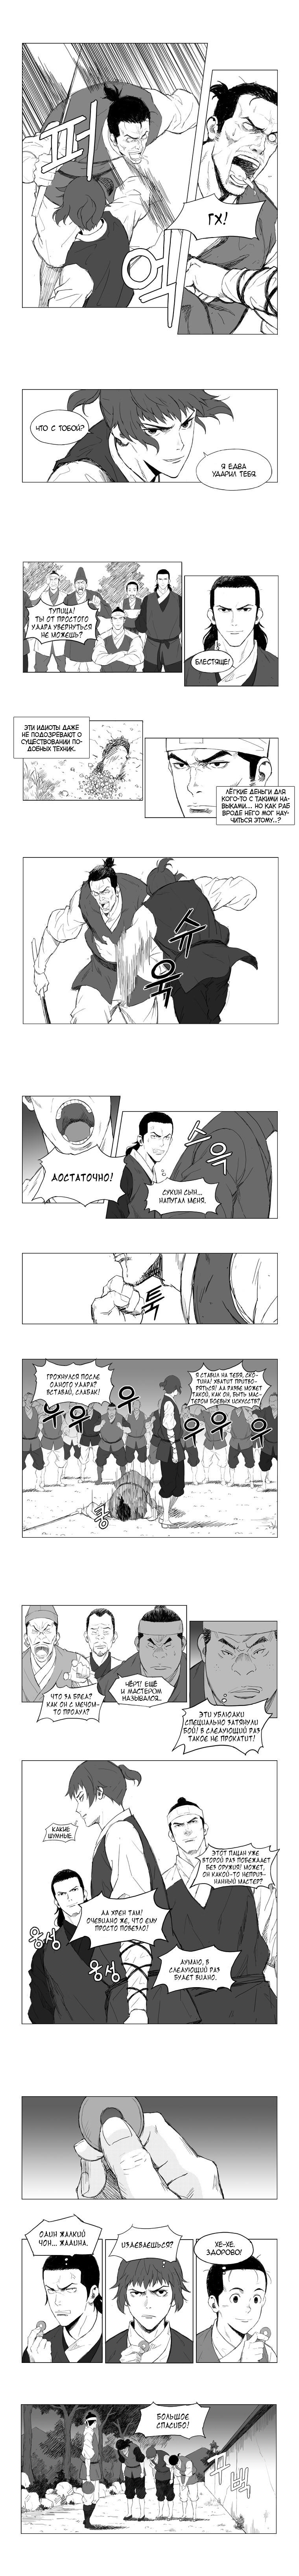 https://r1.ninemanga.com/comics/pic2/39/28263/282869/1453669805973.jpg Page 3